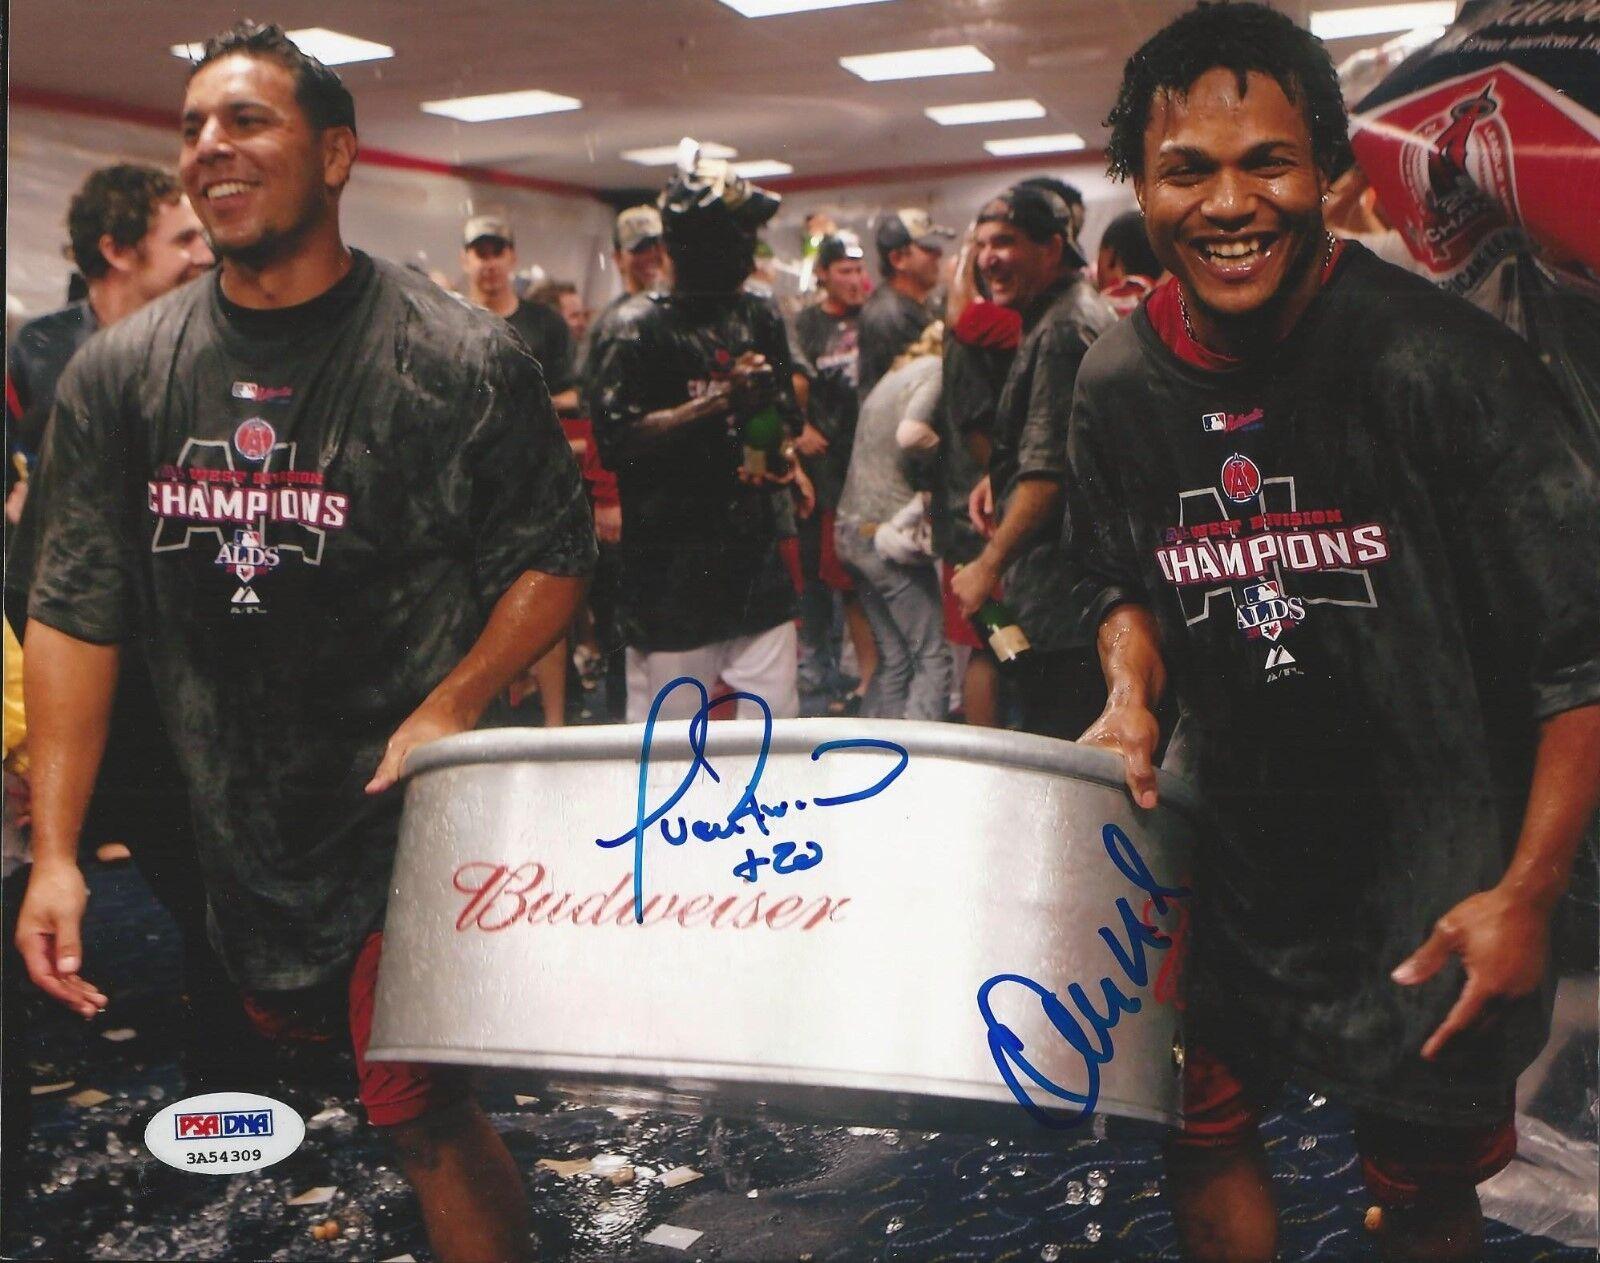 Erick Aybar & Juan Rivera Los Angeles Angels signed 8x10 photo PSA/DNA # 3A54309